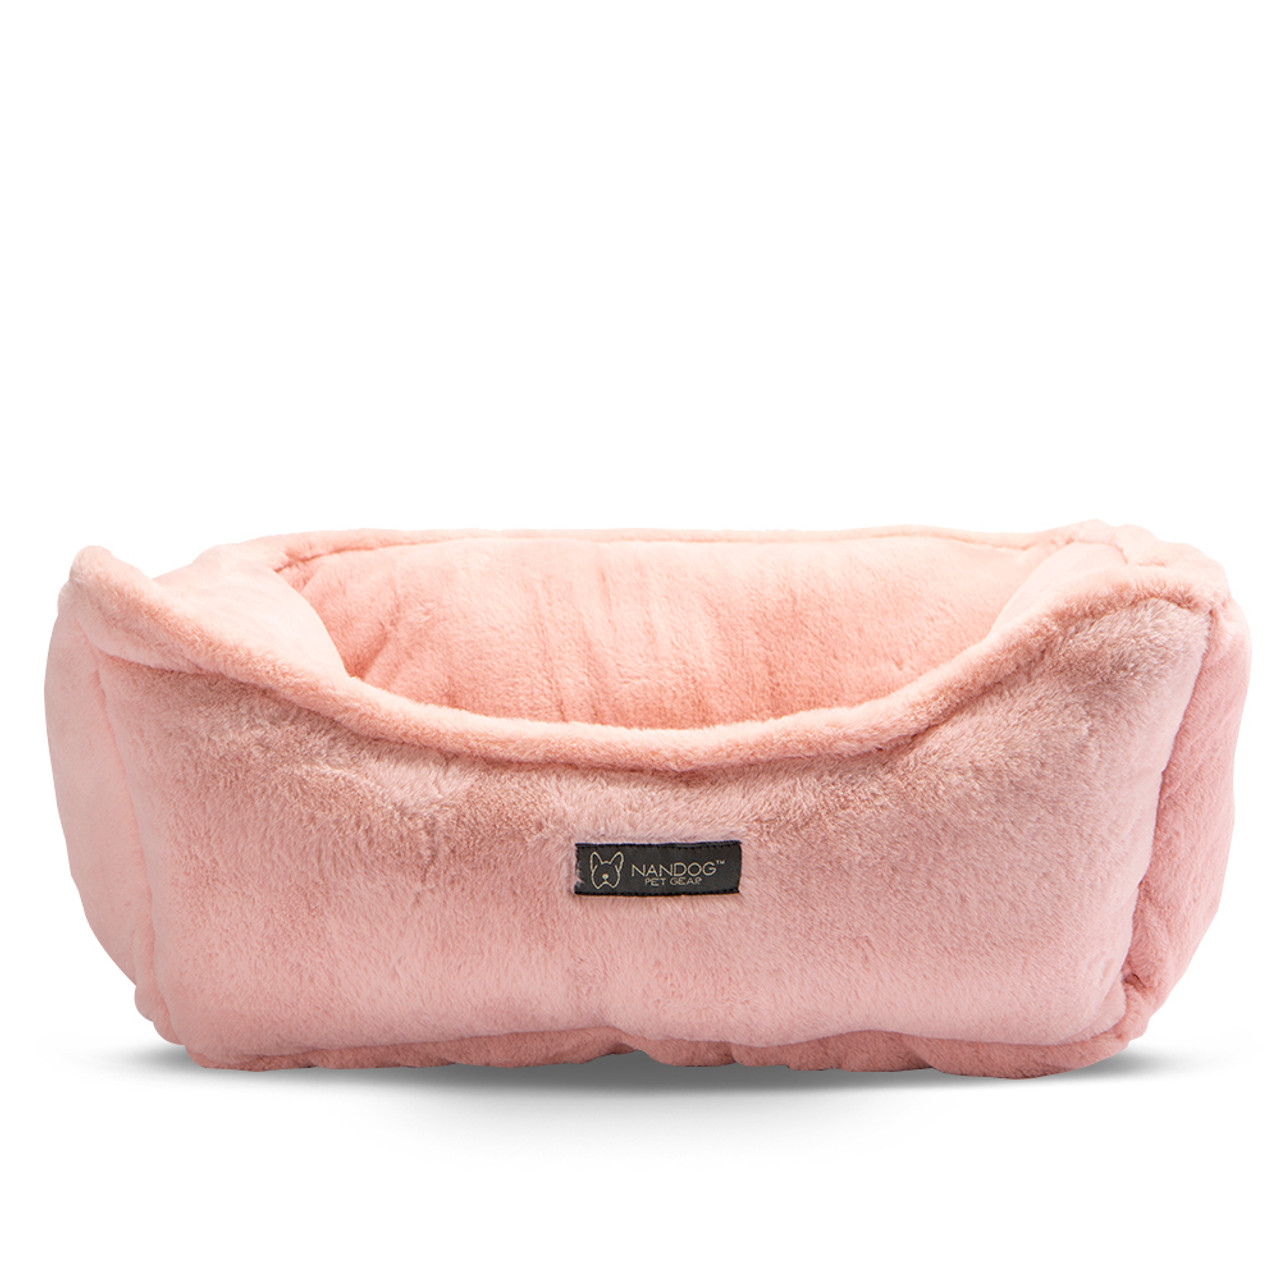 NanDog Luxury Cloud Blush Pet Bed